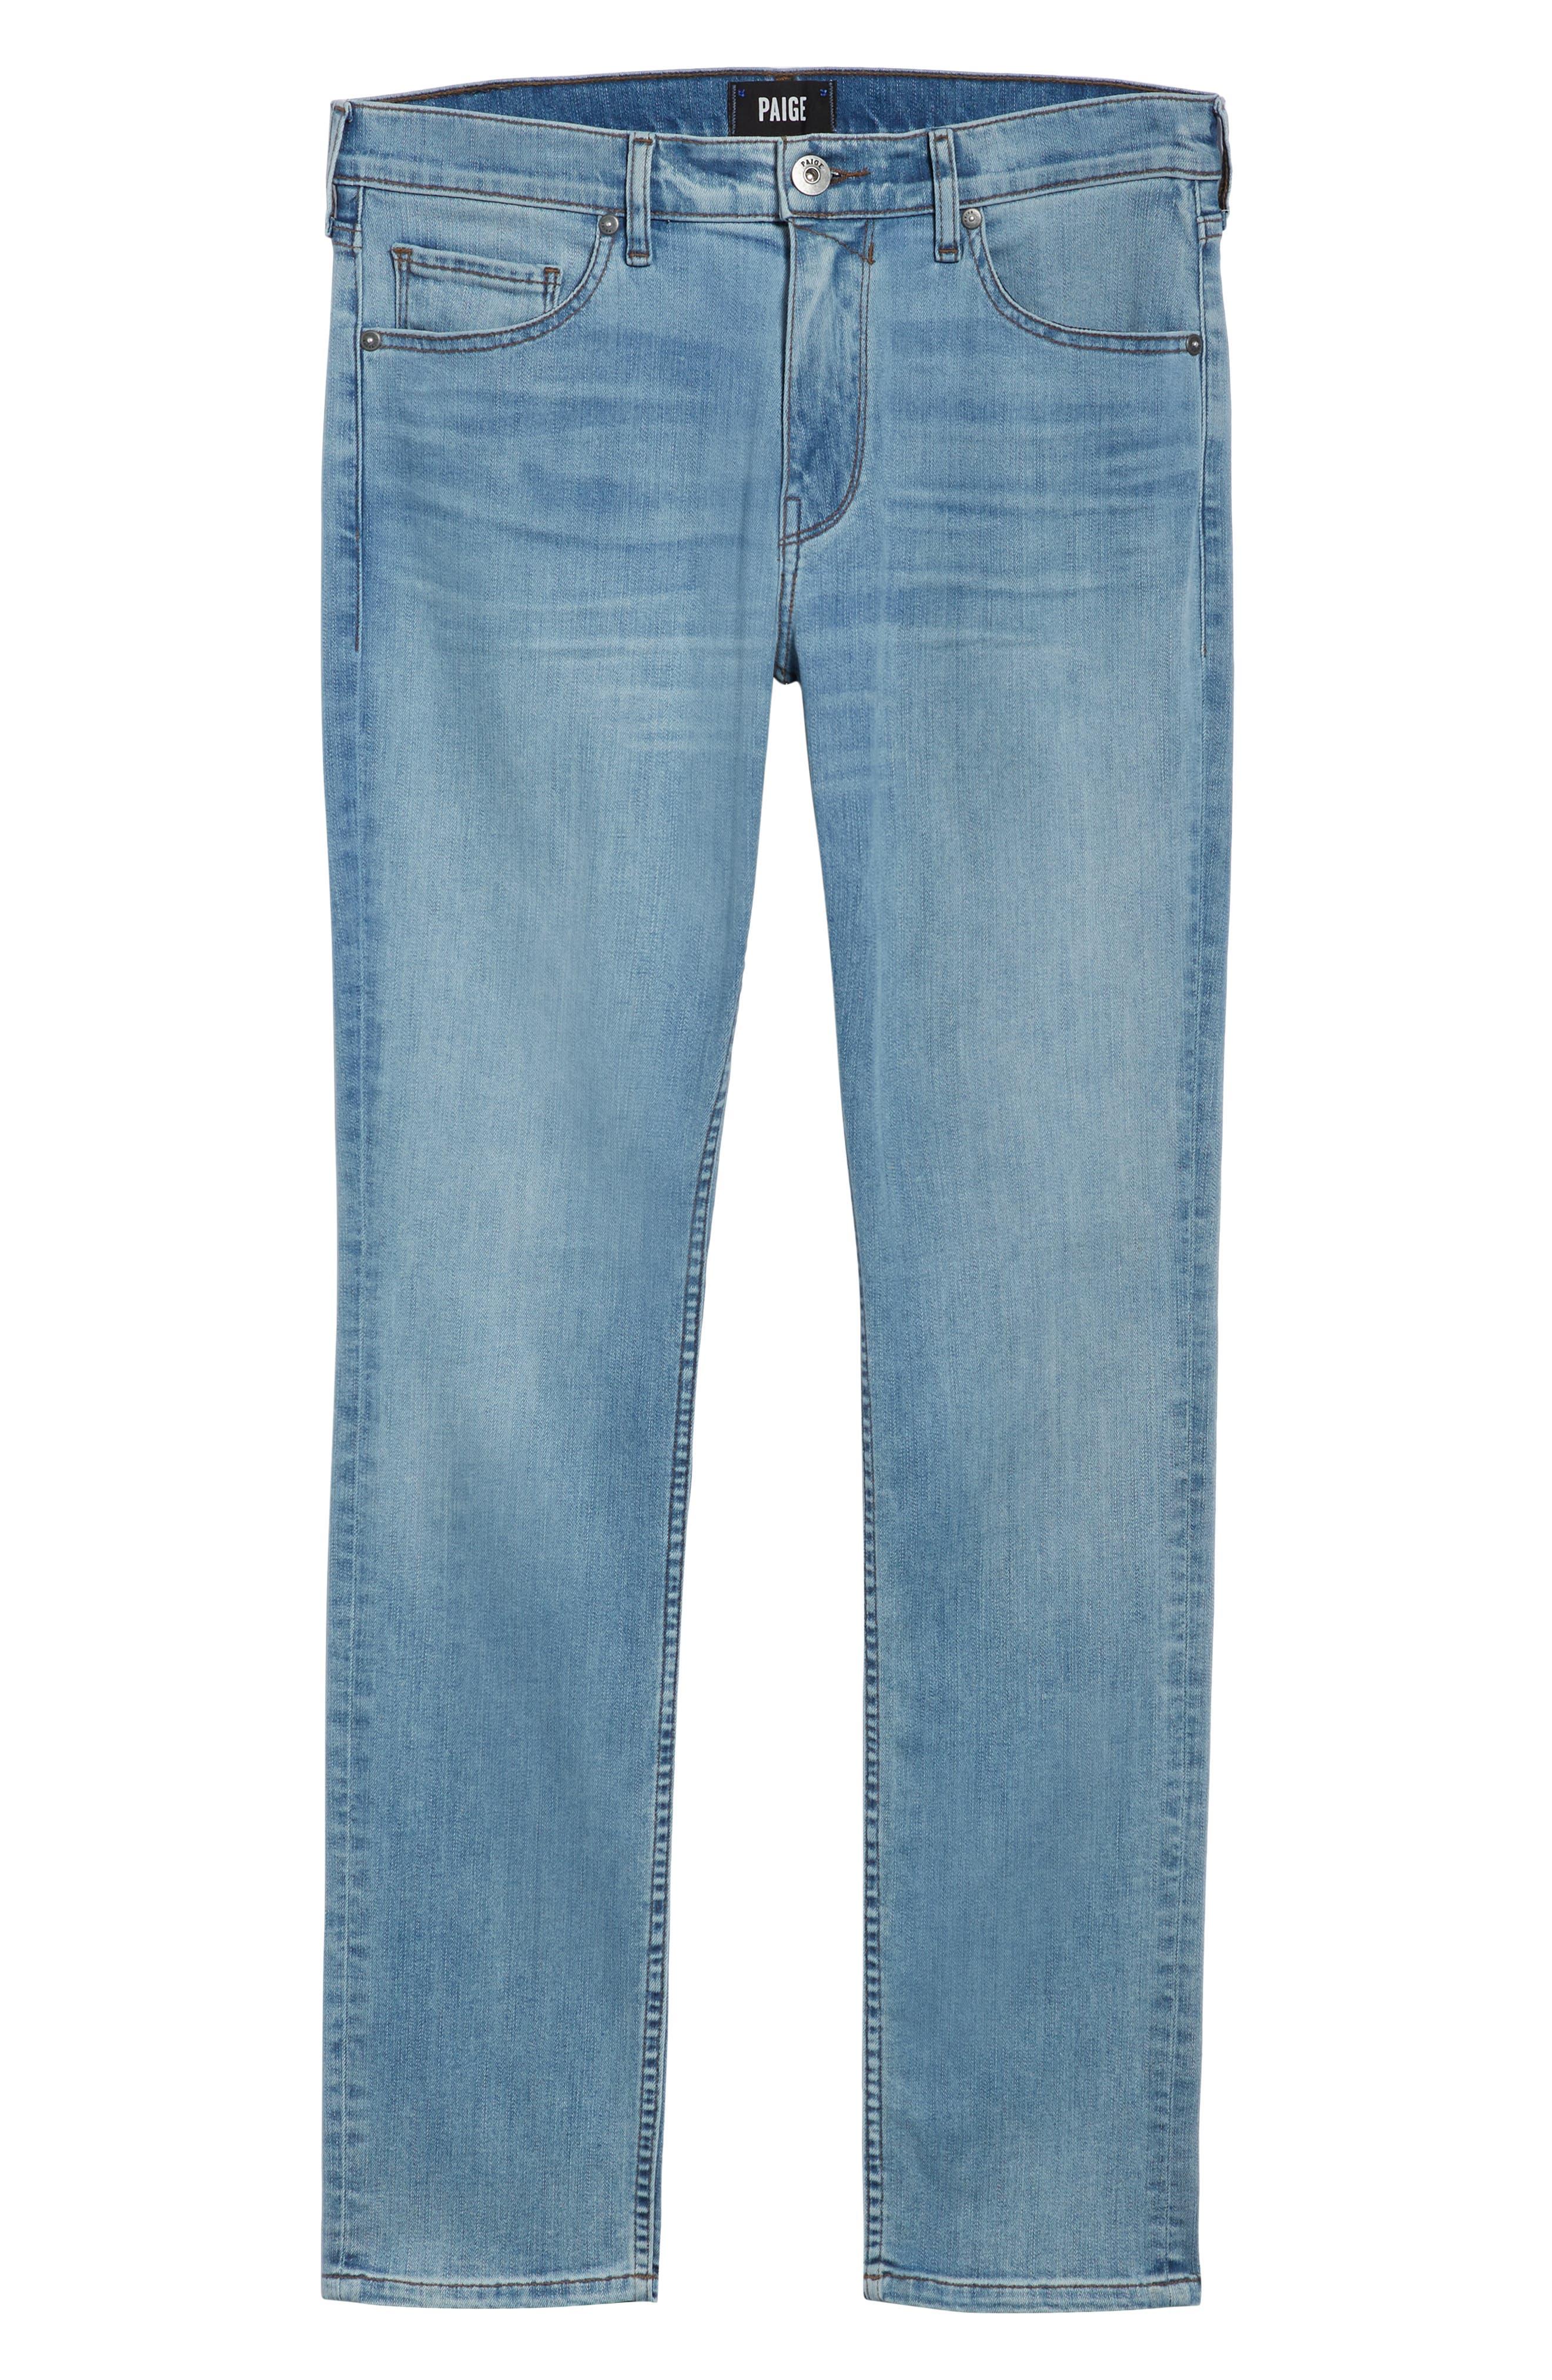 Transcend Vintage - Lennox Slim Fit Jeans,                             Alternate thumbnail 6, color,                             DENVER